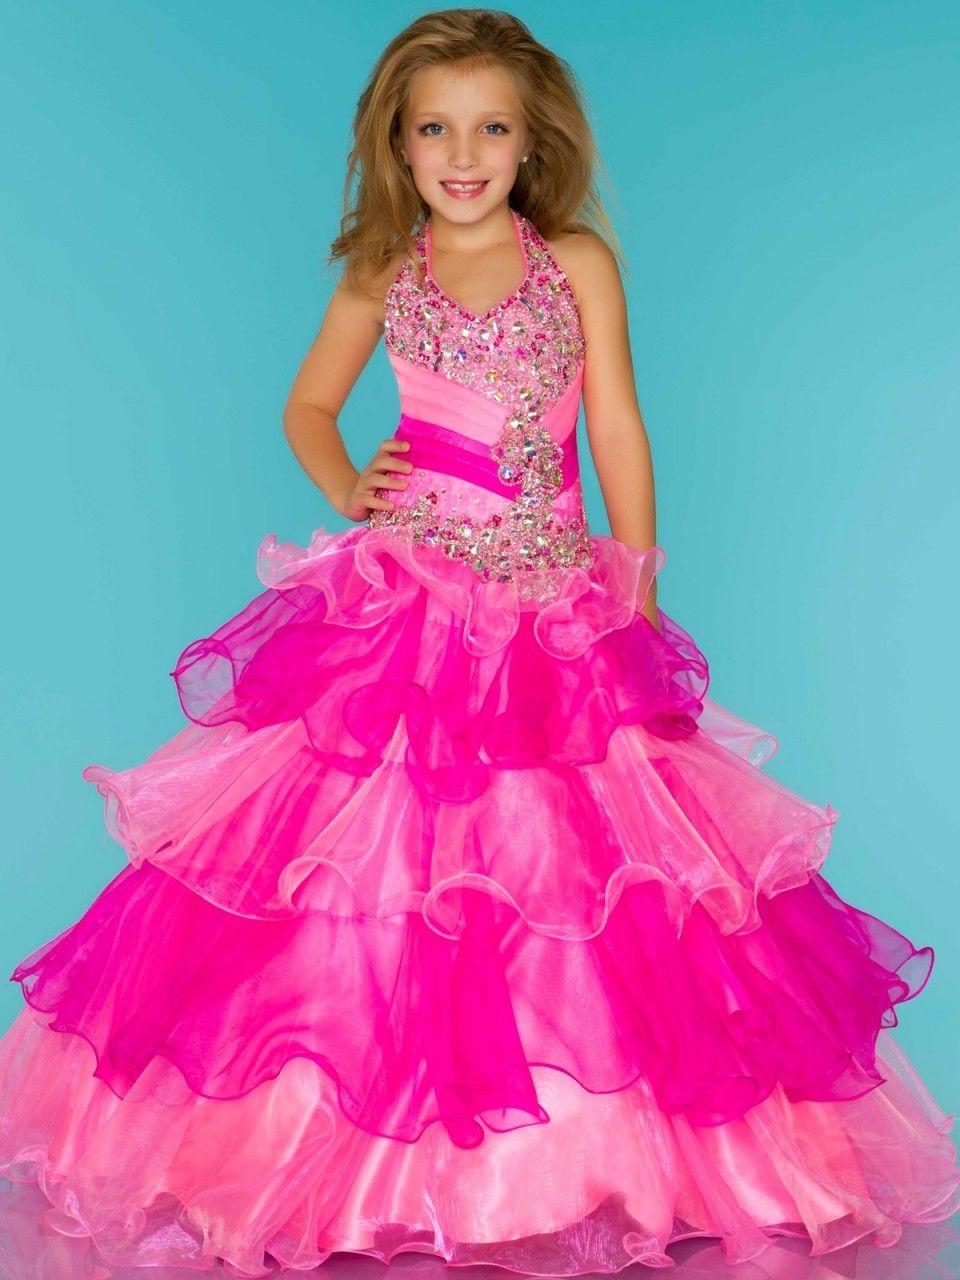 Glitz pageant dresses for rent - Preteen Pageant Gowns Sugar Glitz Pageant Dress 81807s